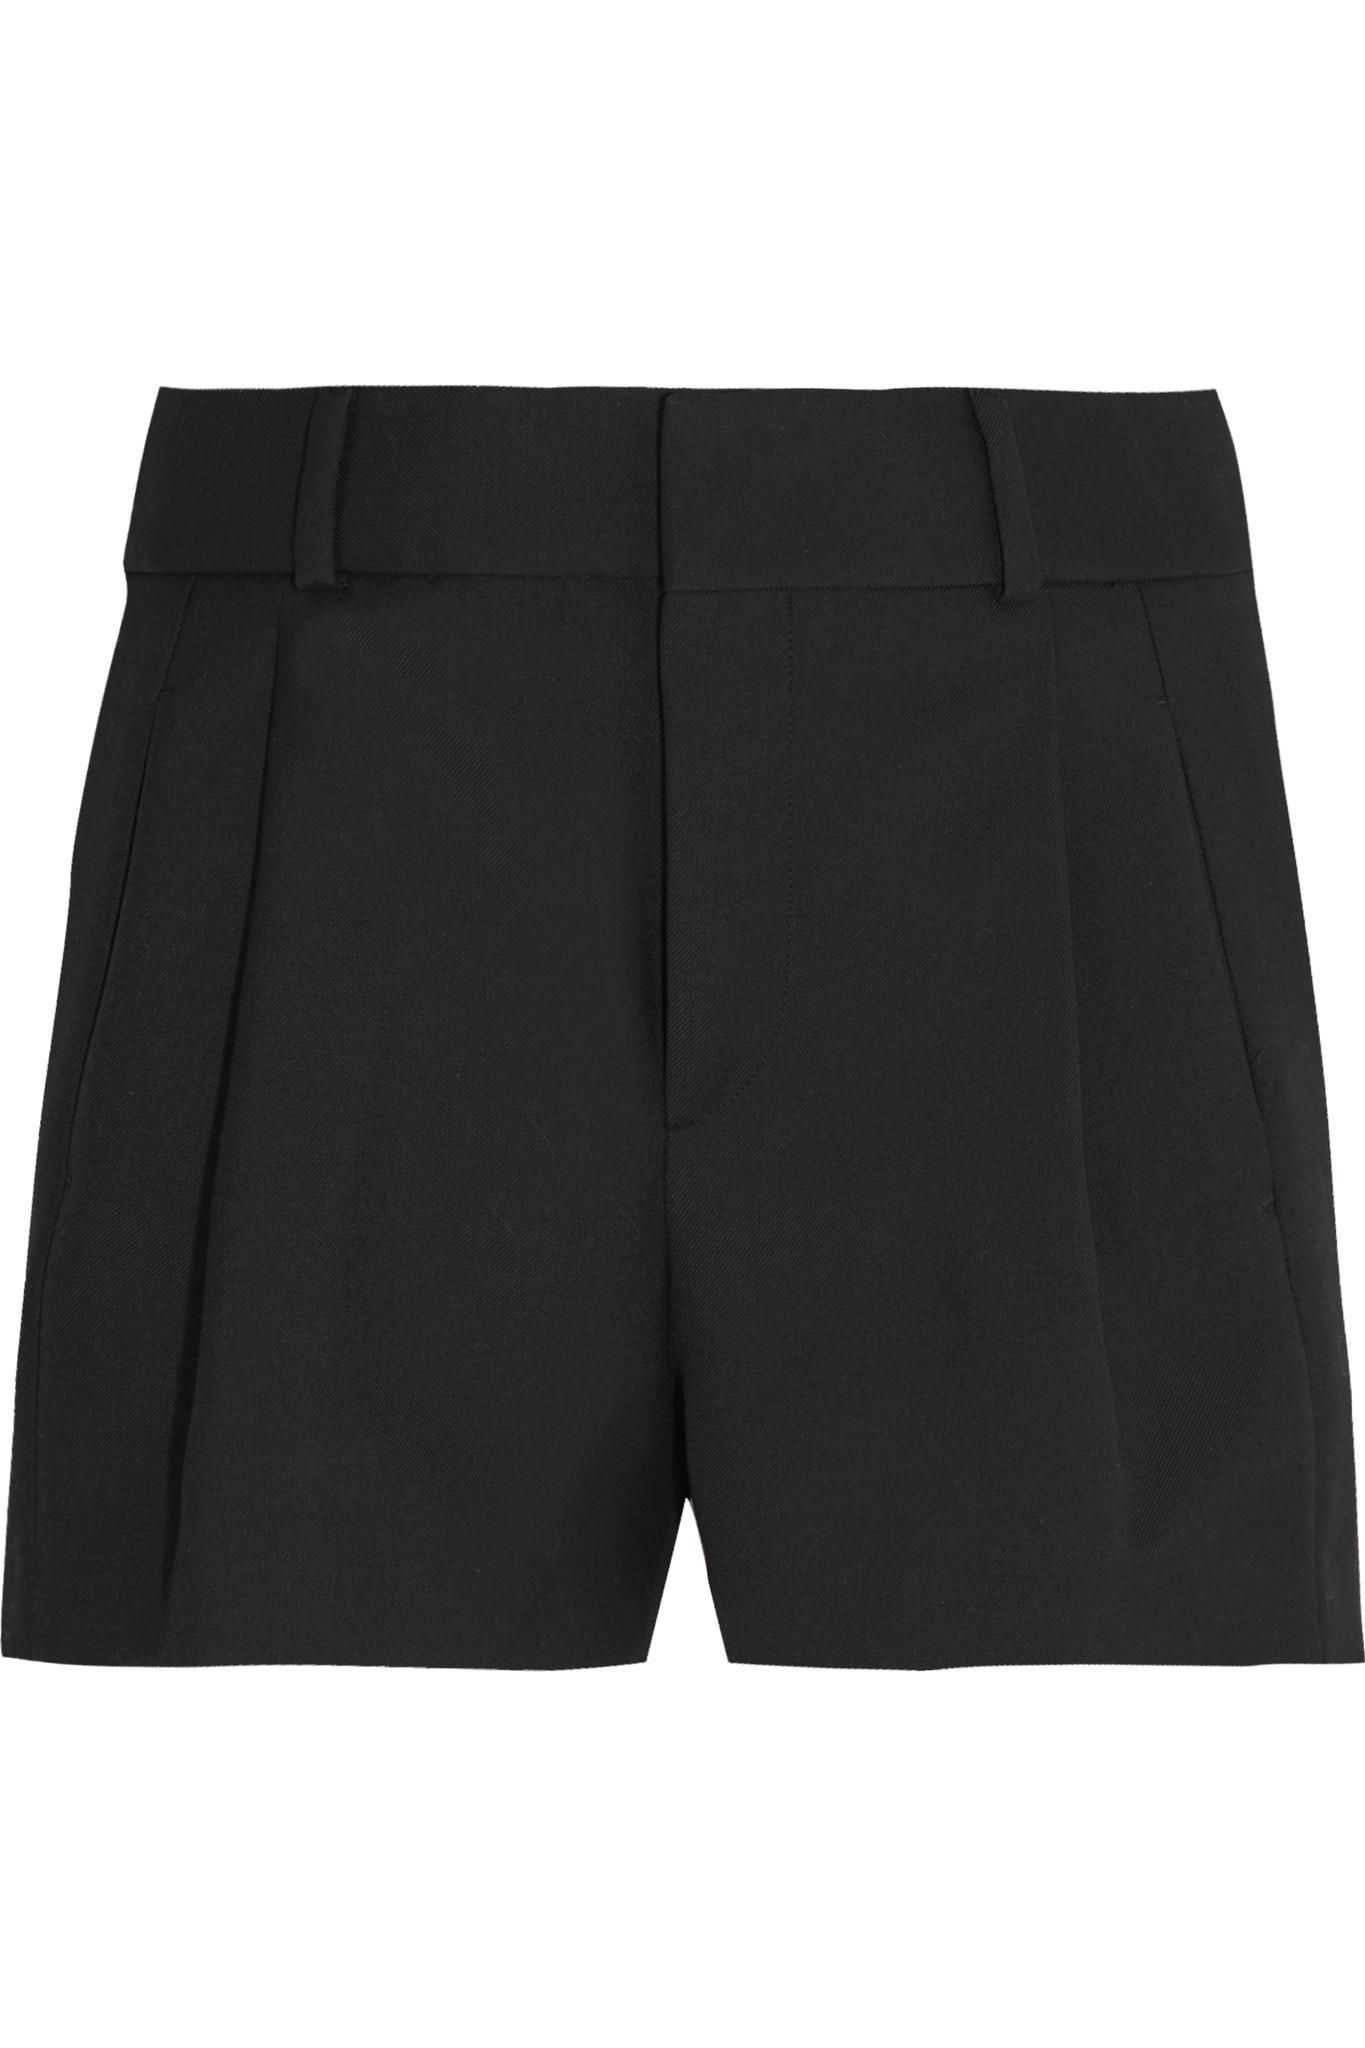 Discount Best Sale Wool-gabardine Shorts - Black Saint Laurent Eastbay Sale Online Big Discount Cheap Price Big Sale For Sale 9exR9YVj